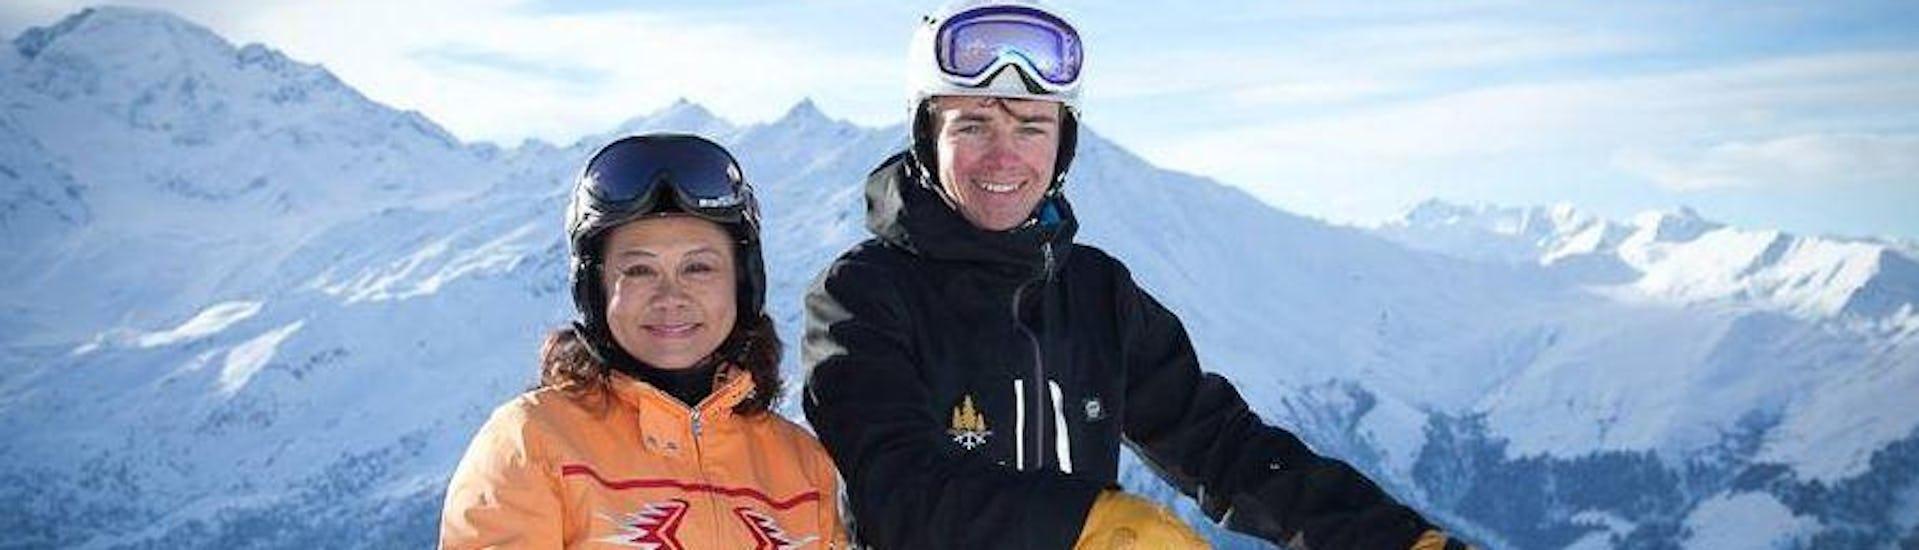 "Ski Lessons for Adults ""Clinic"" - Advanced - Nendaz"